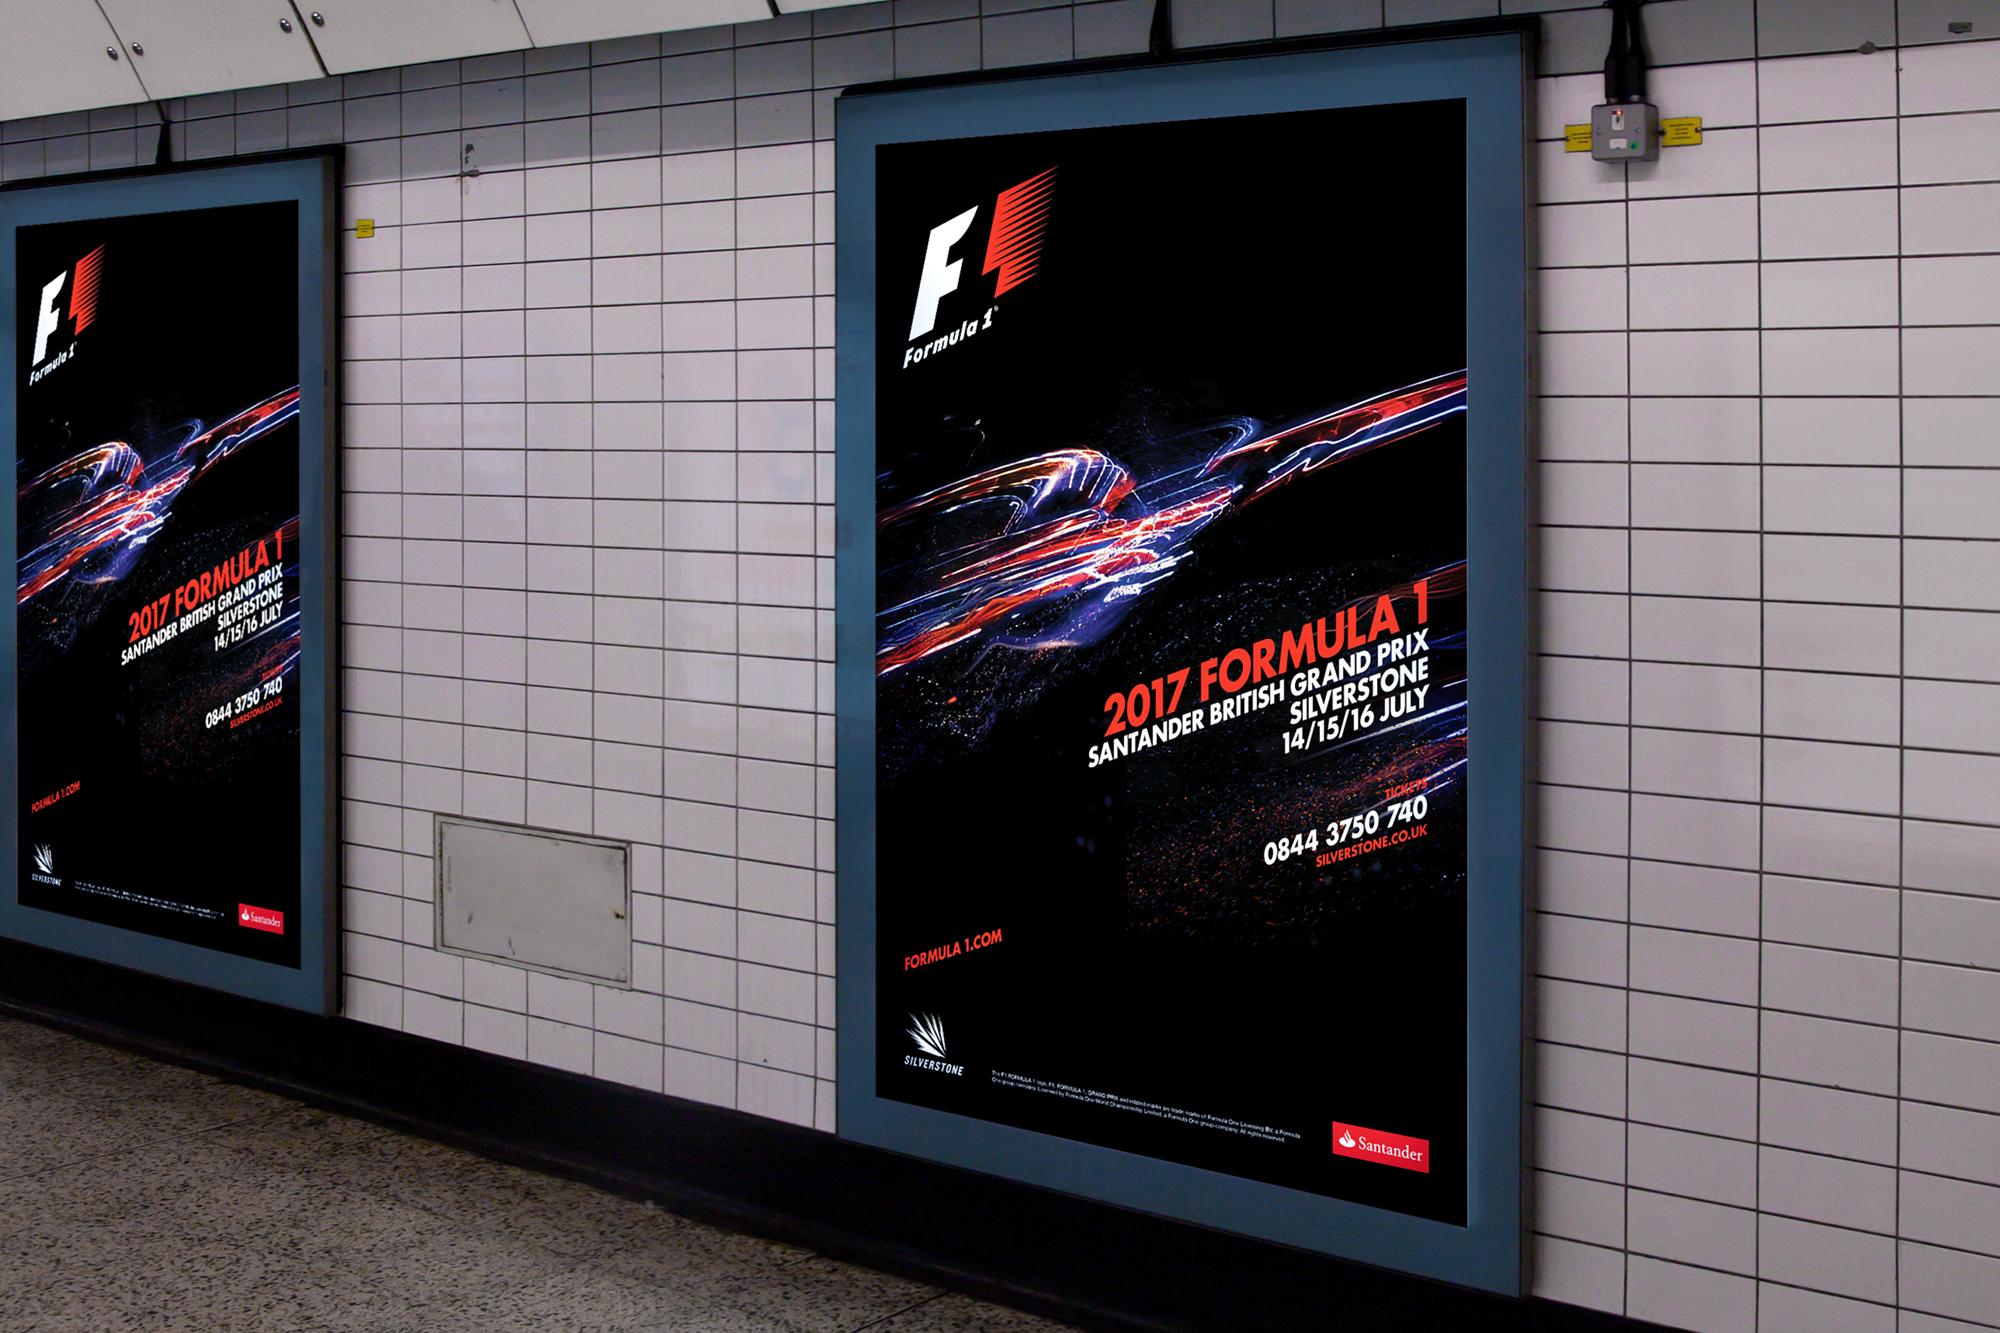 Silverstone_F1_2017_CaseStudies_IMAGES_1.jpg